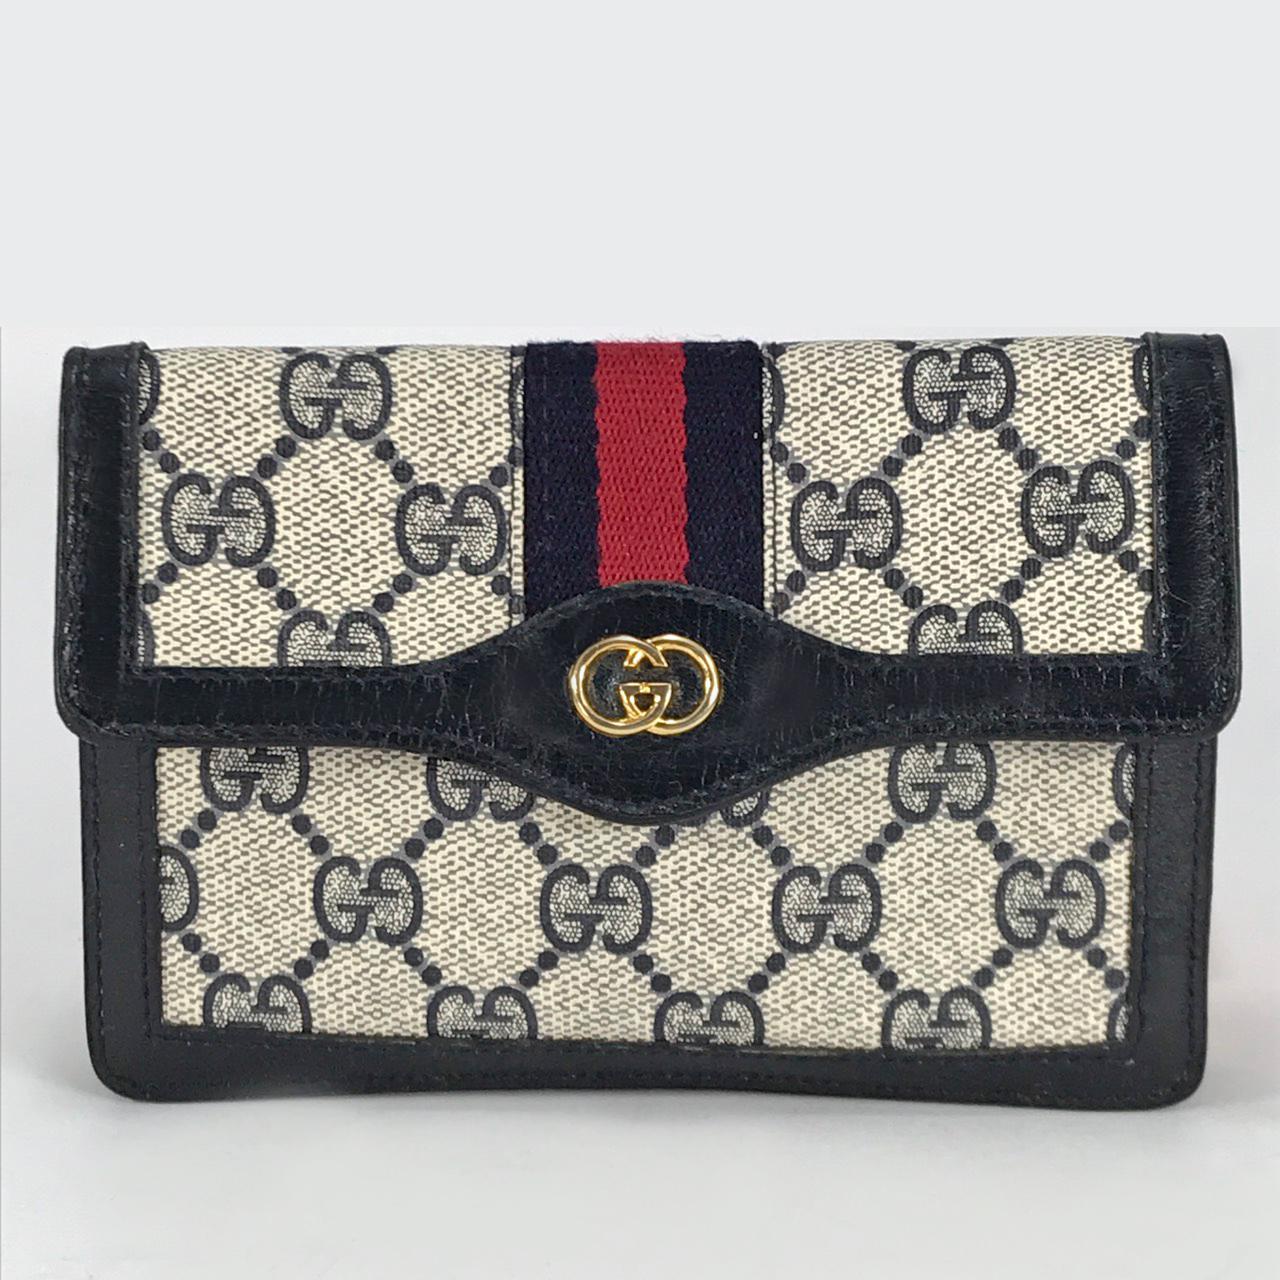 quality design 14284 e66fe OLD Gucci シェリーライン財布&ポーチ(青) | Vintage Shop Rococo